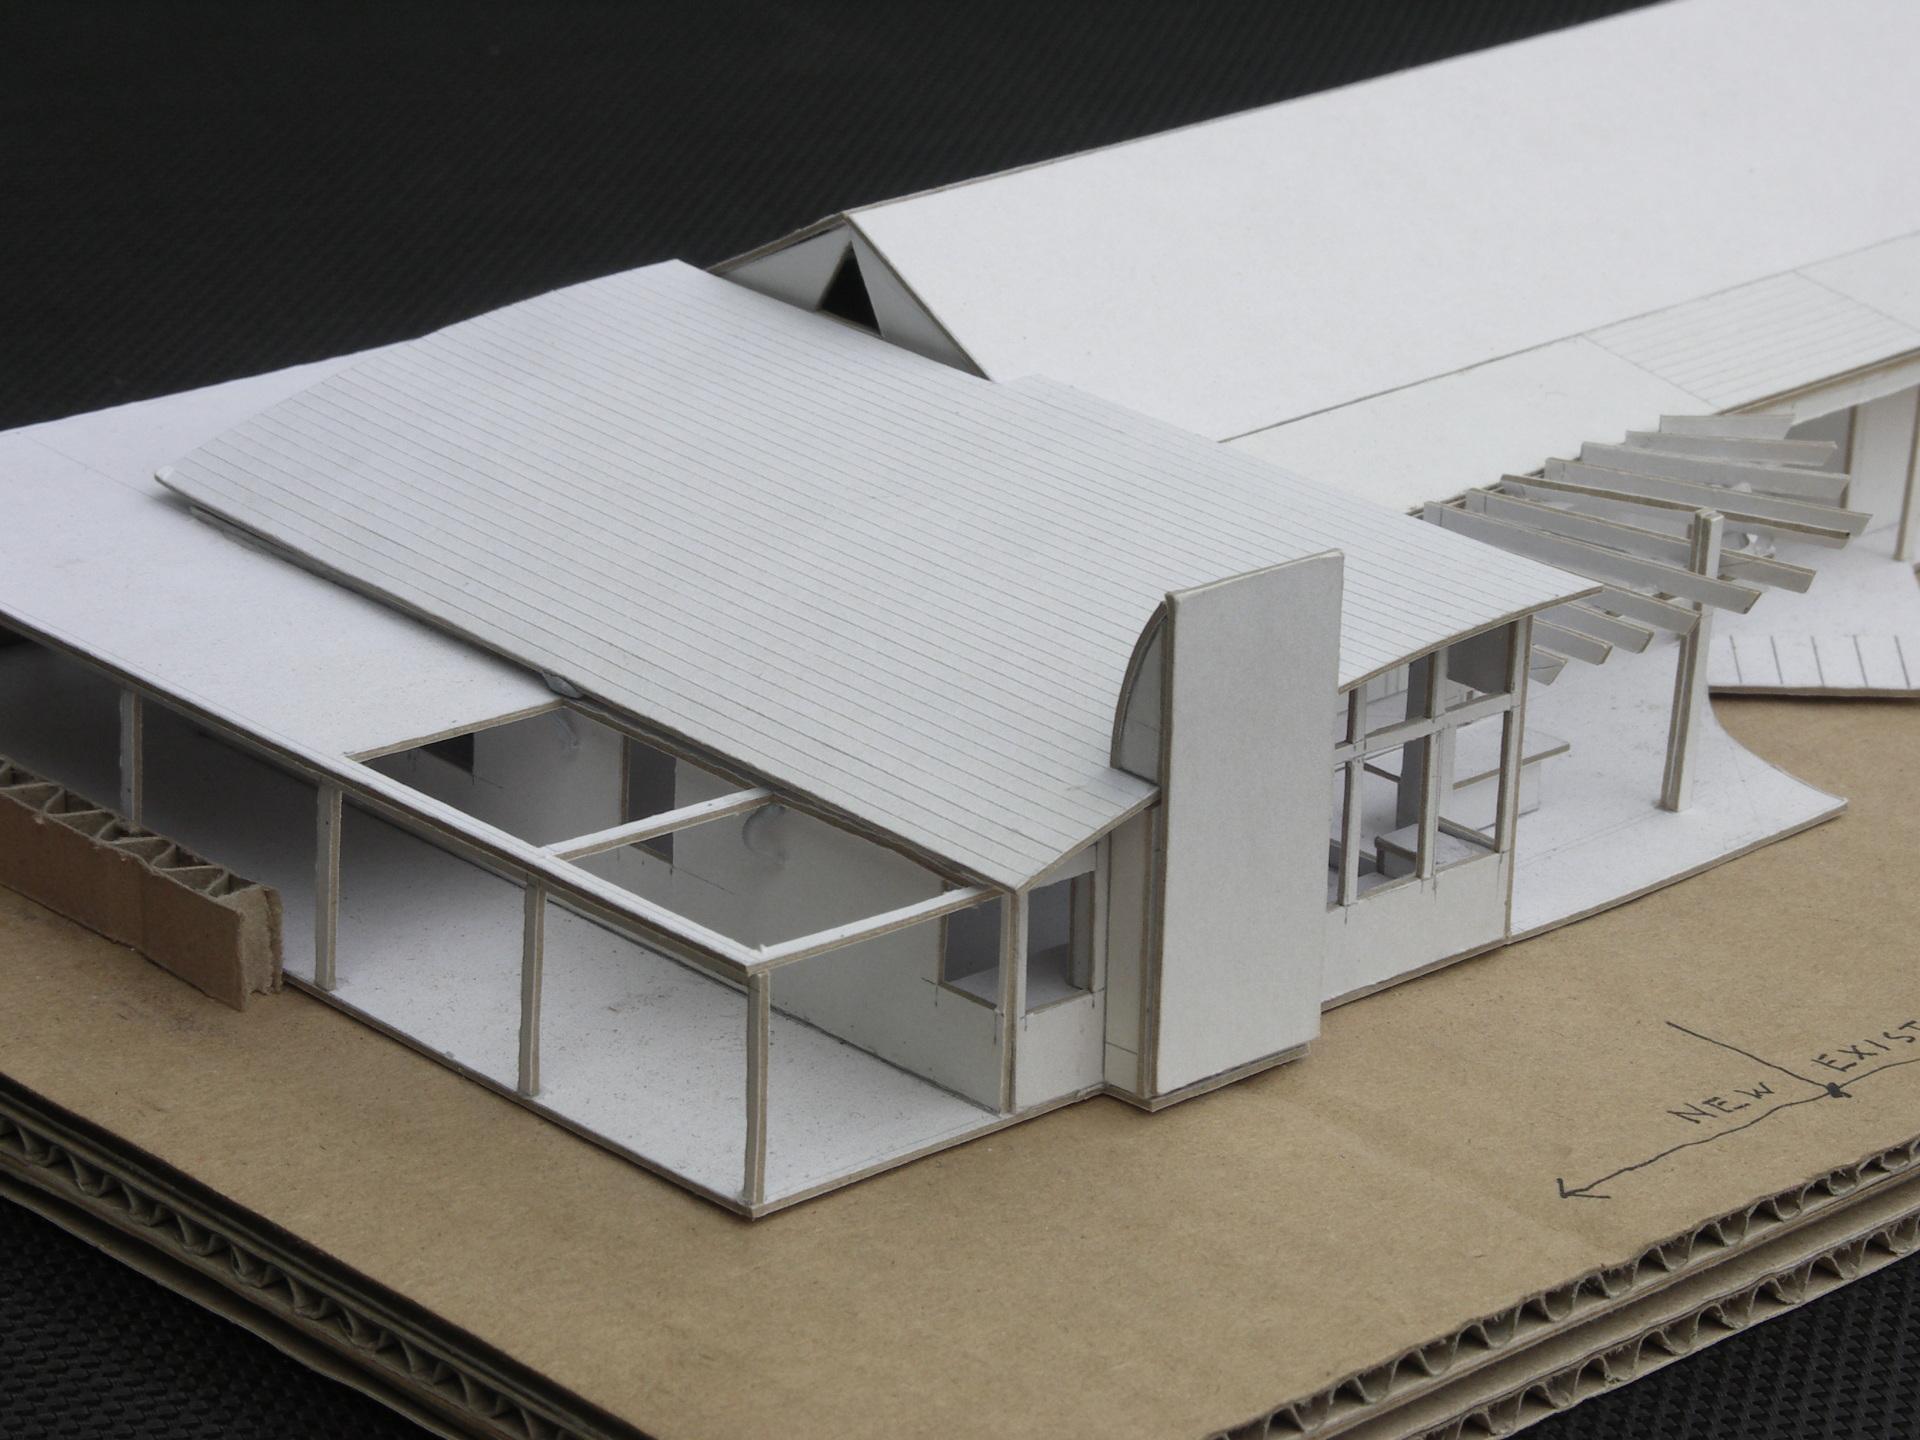 Hepburn House designed by sustainable architect Green Point Design. Architect's model.